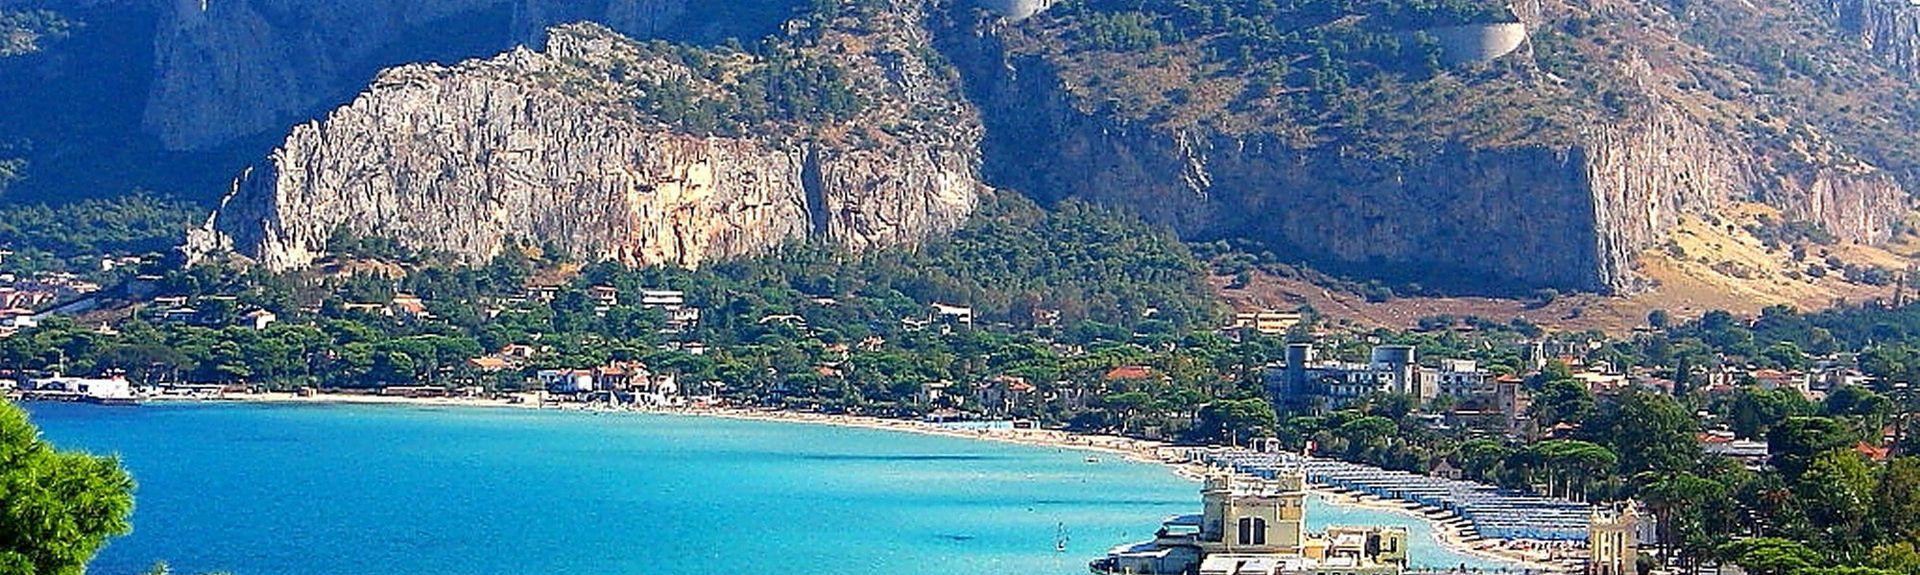 Misilmeri, Palermo, Sicily, Italy